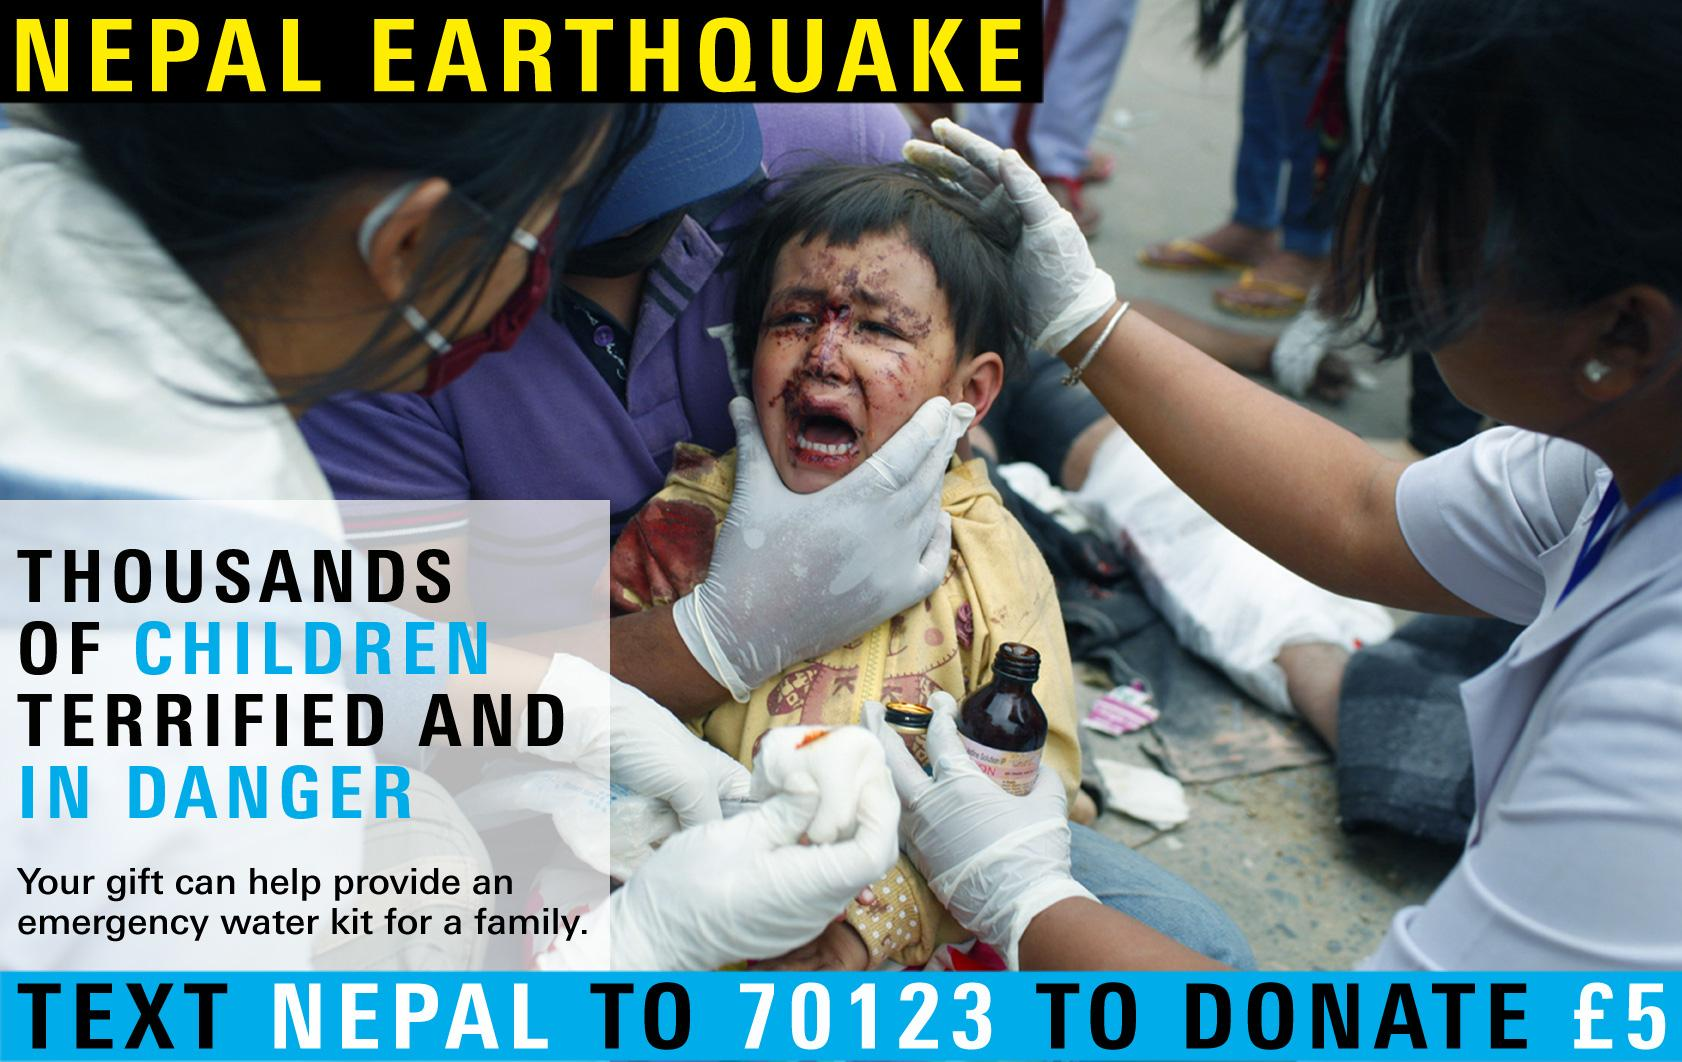 RT @UNICEF_uk: PLS RT: Help 3 million children in danger in #Nepal  Text NEPAL to 70123 to donate £5  T&Cs: http://t.co/bHLIQGp1TH http://t…